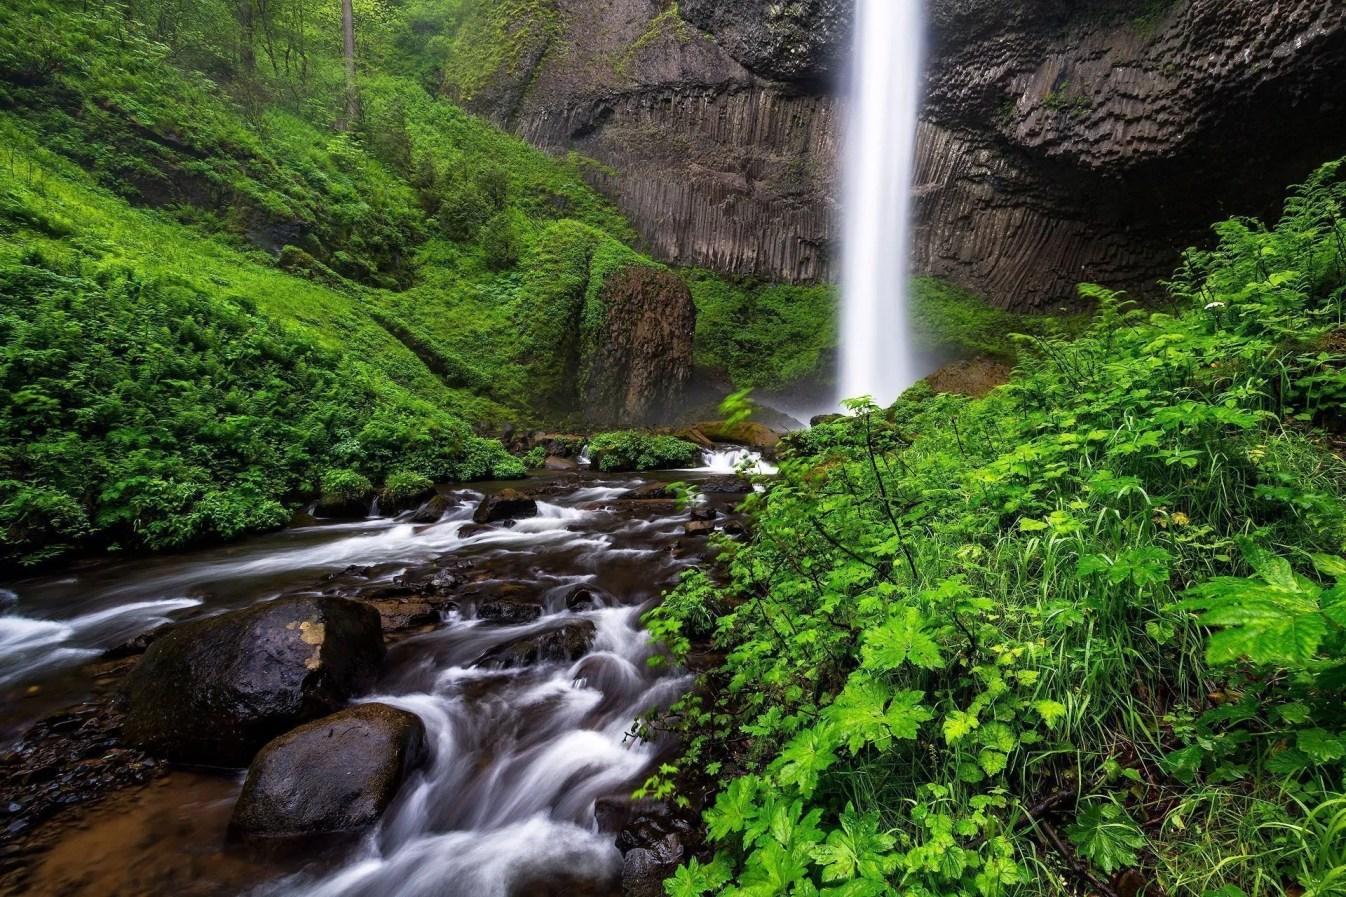 Latourell Falls Rainy Day - Columbia River Gorge - Landscape Pho